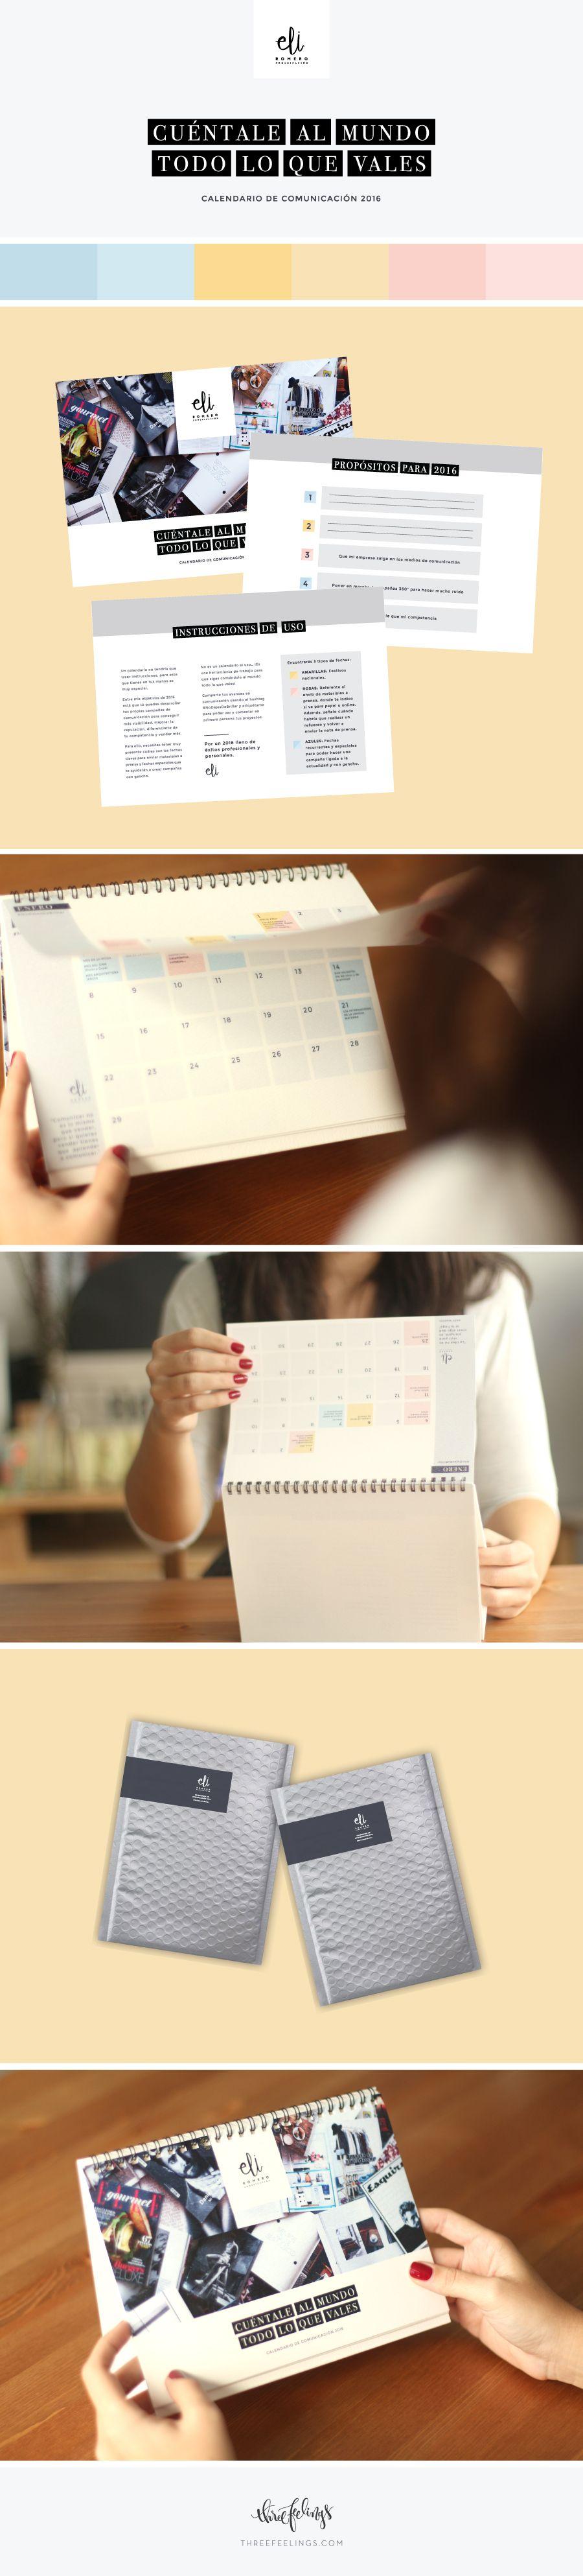 Portfolio-EliRomeroComunicacion-Calendario